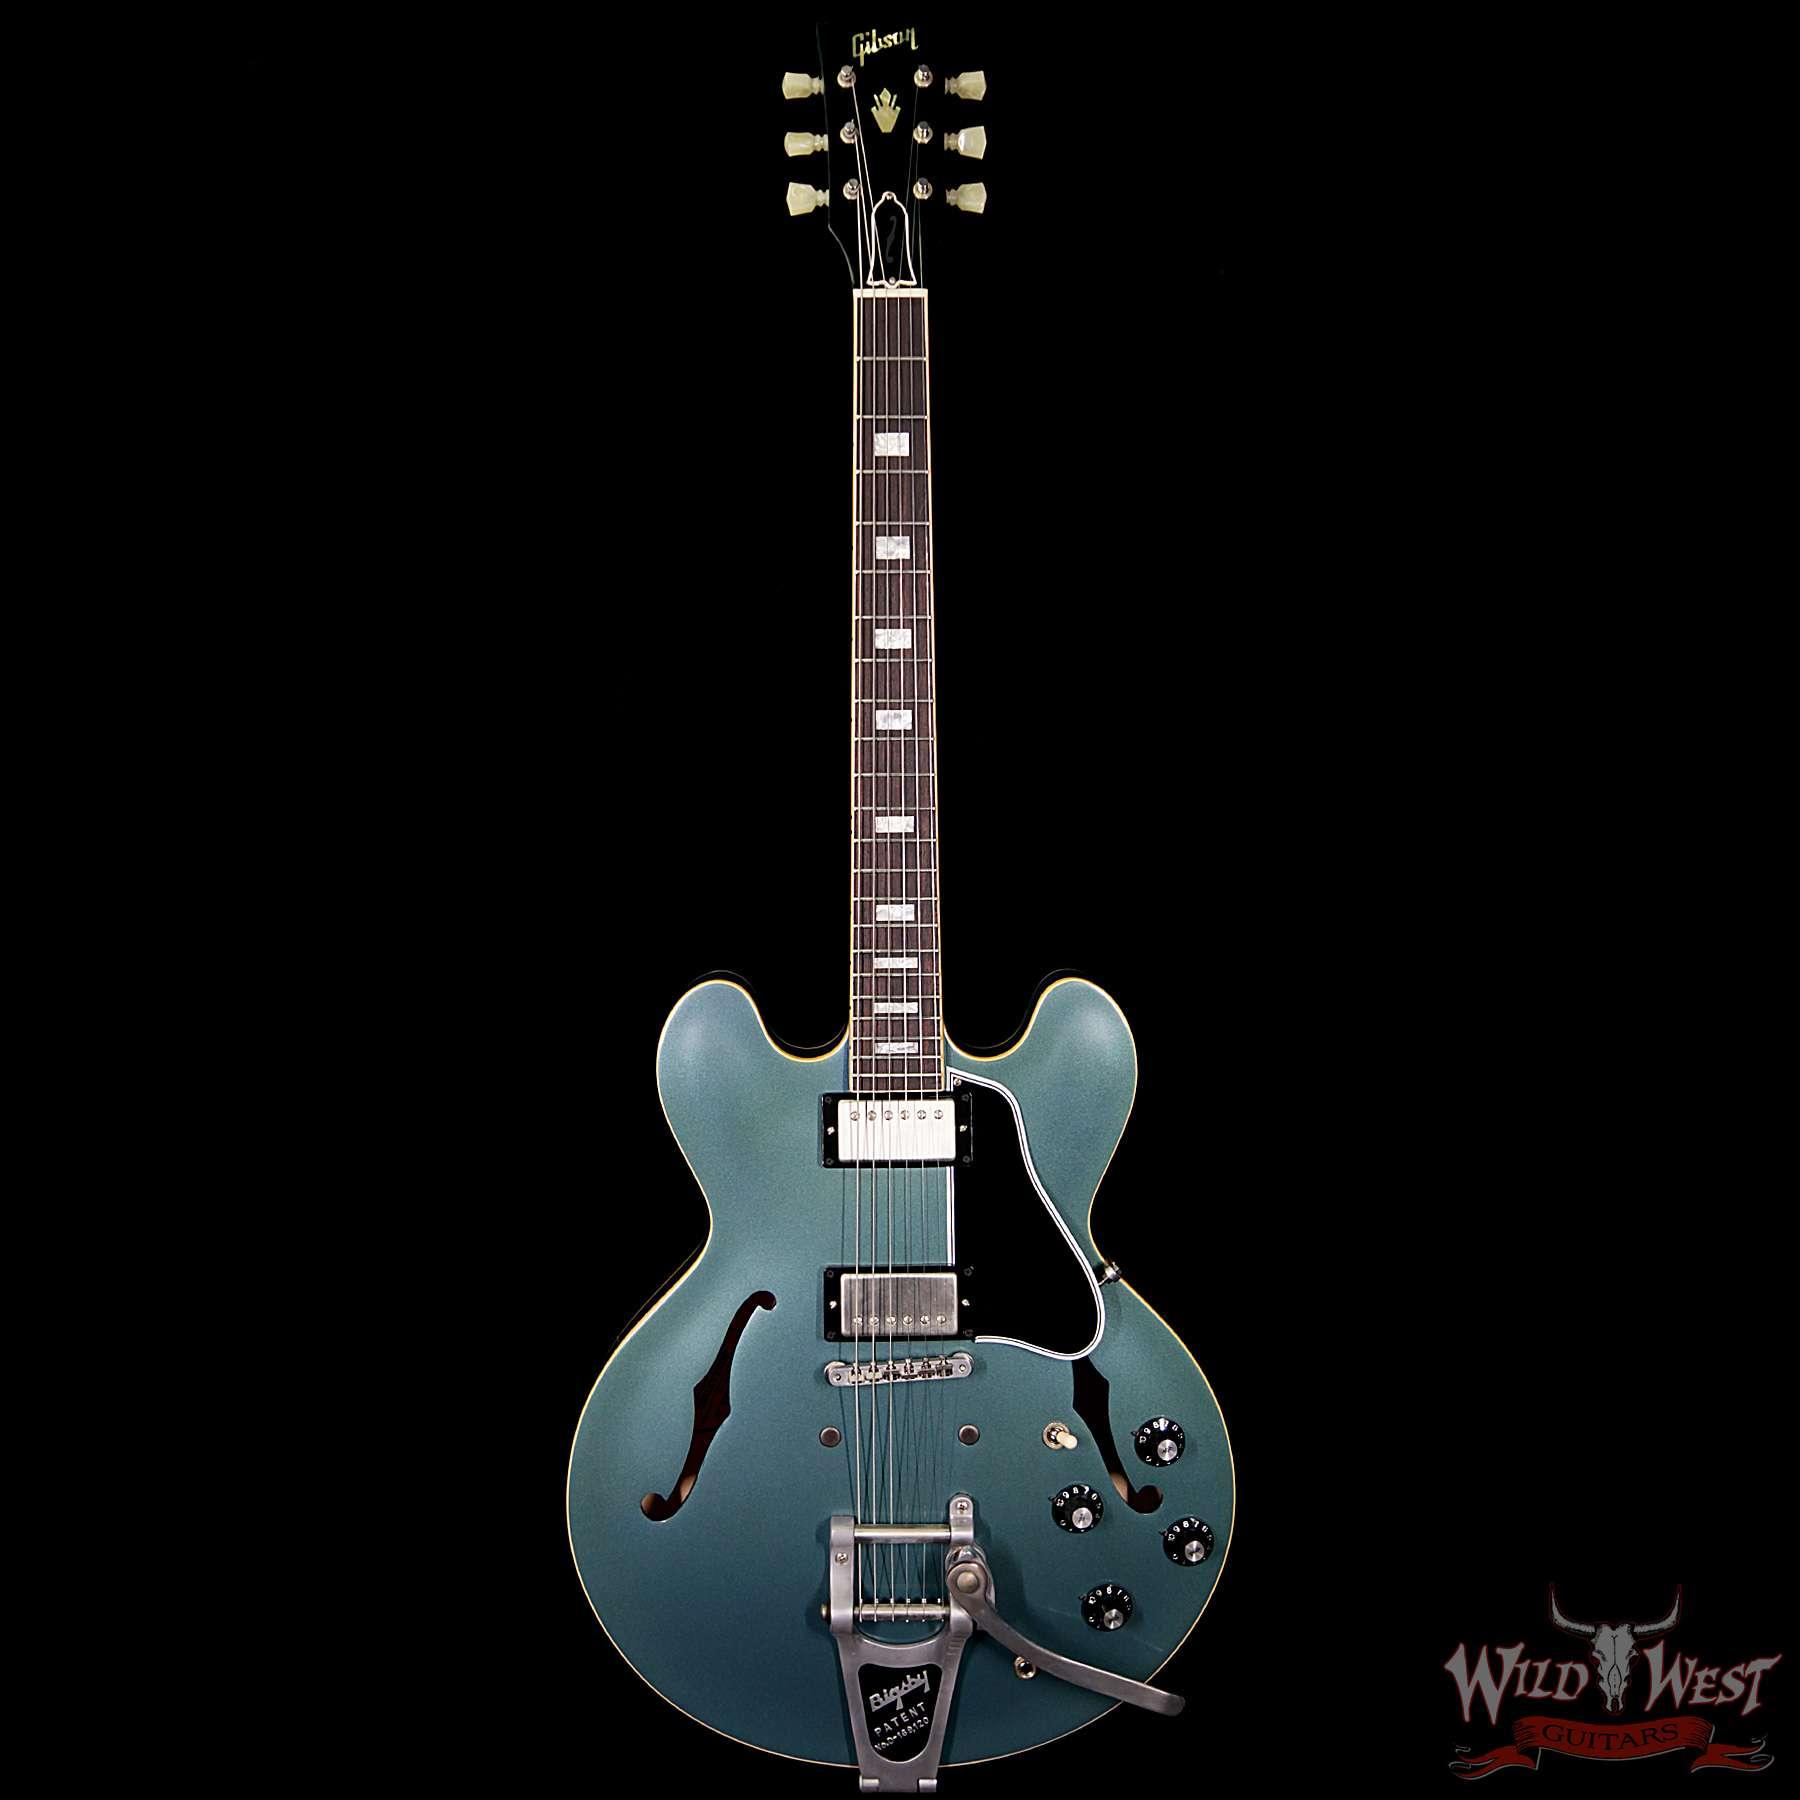 Gibson Memphis Es 335 Anchor Stud 2018 Vos Bigsby Antique Pelham Wiring Harness Wild West Authentic